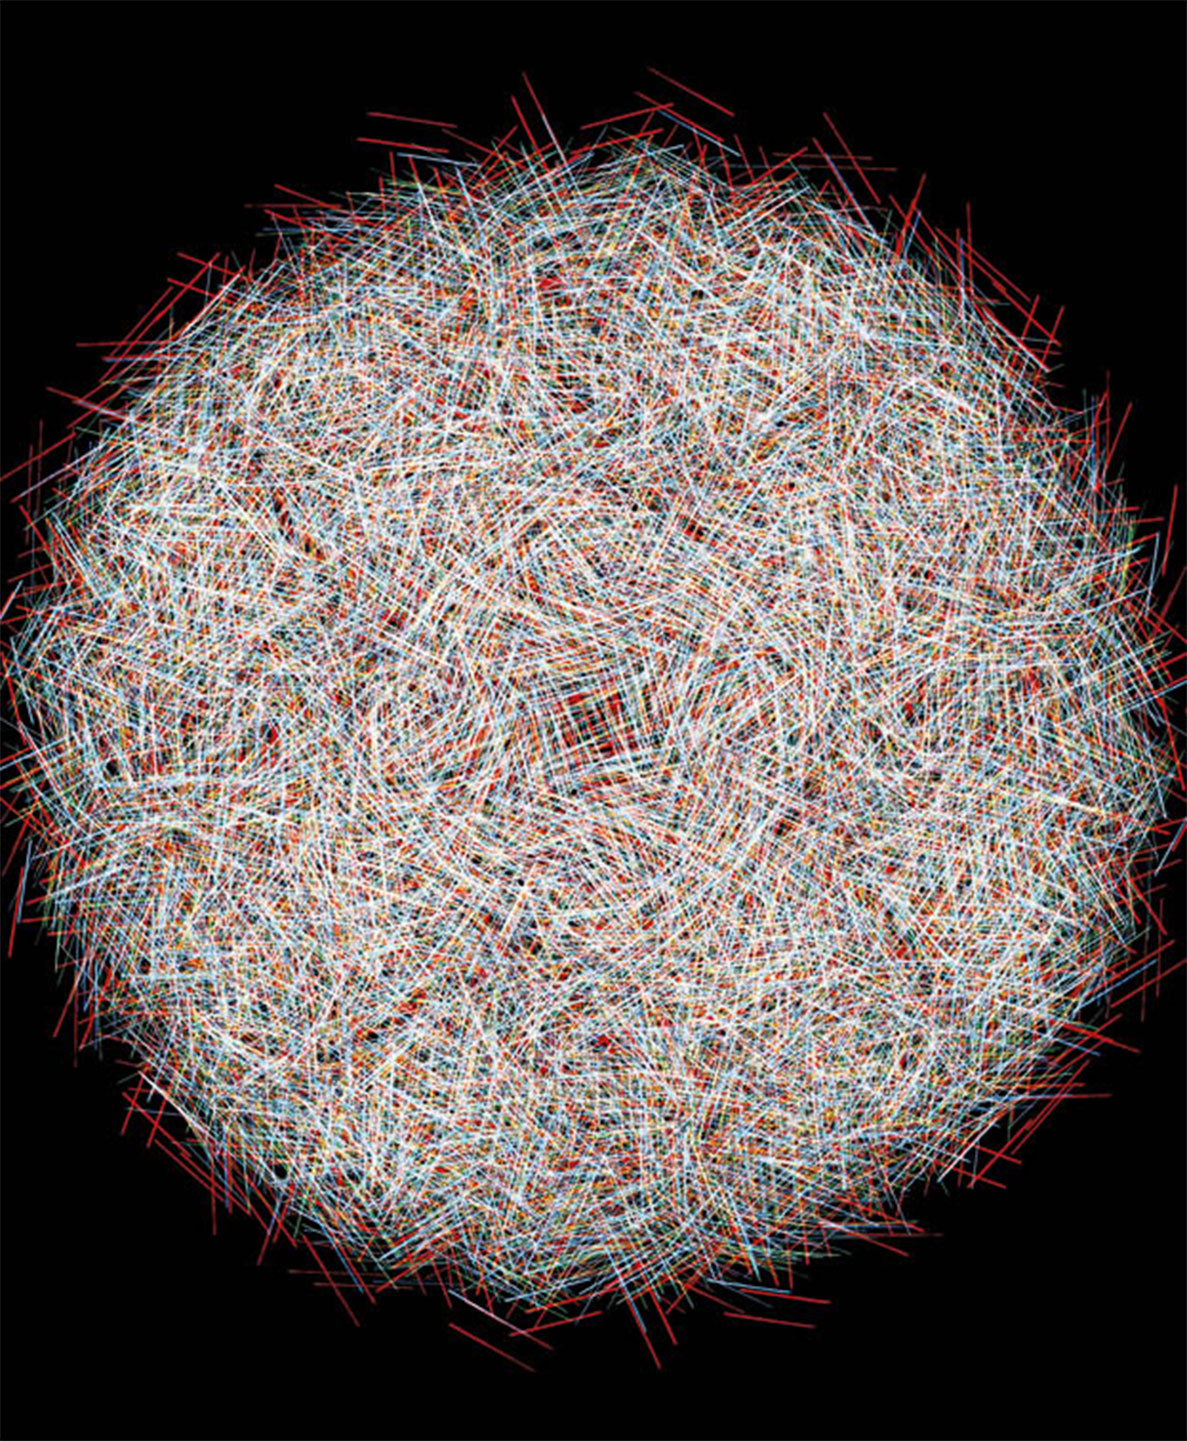 AG_Artist_NikoLuoma2006-2012_3